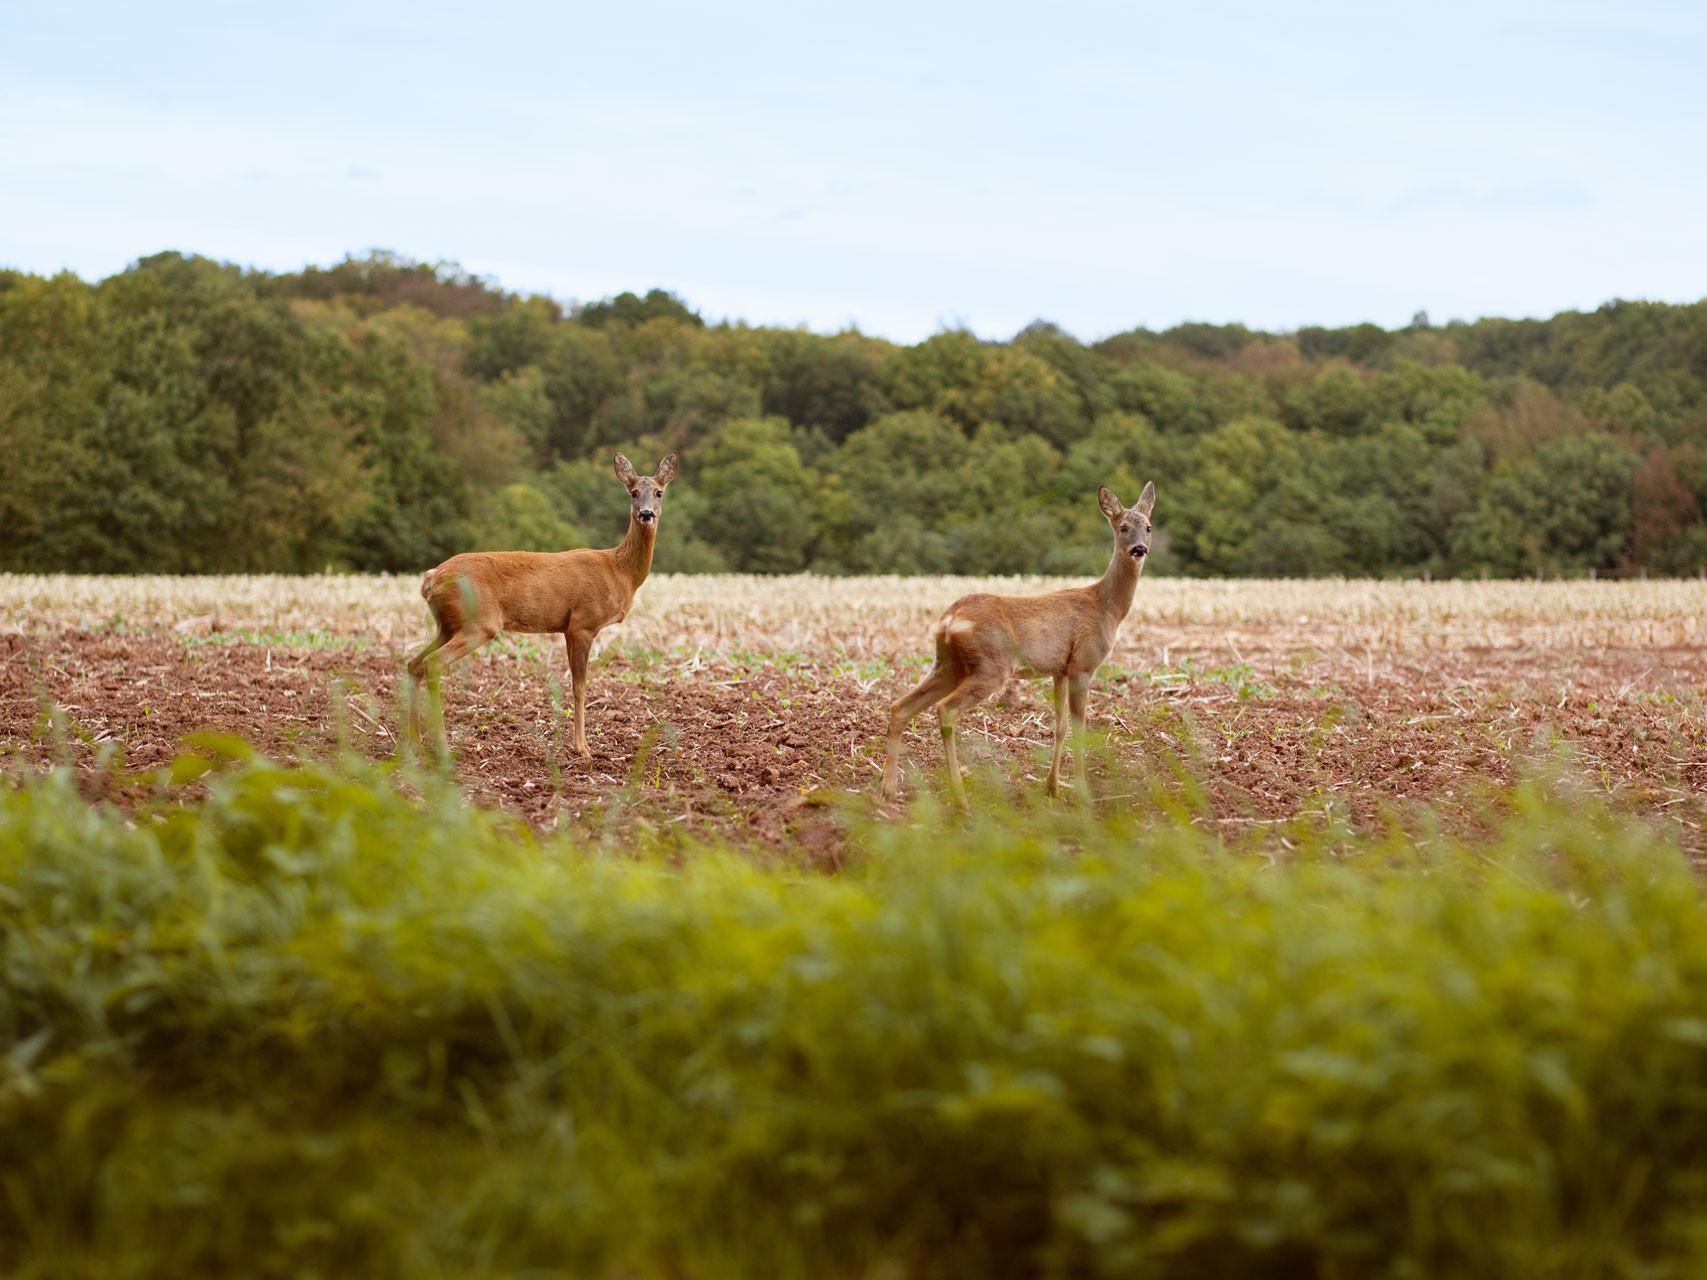 Timo_Stammberger_Duderstadt_Landscape_Forerest_Wald_Acker_Rehe_Deer_Feld_Wild